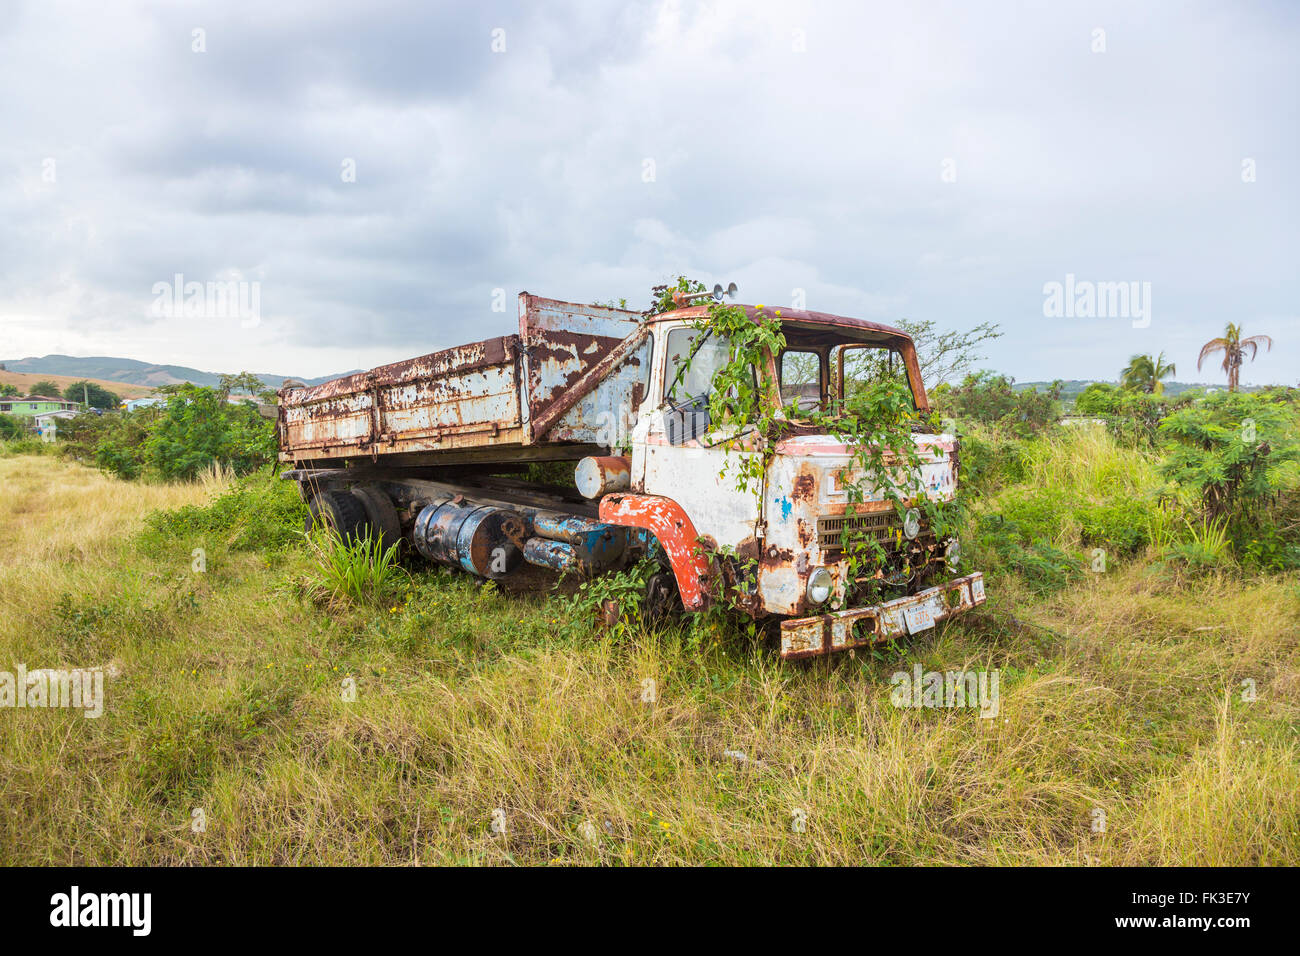 Overgrown Leyland tipper truck in Ogg Spencer's Trucking scrapyard, Liberta, south Antigua, Antigua and Barbuda, - Stock Image